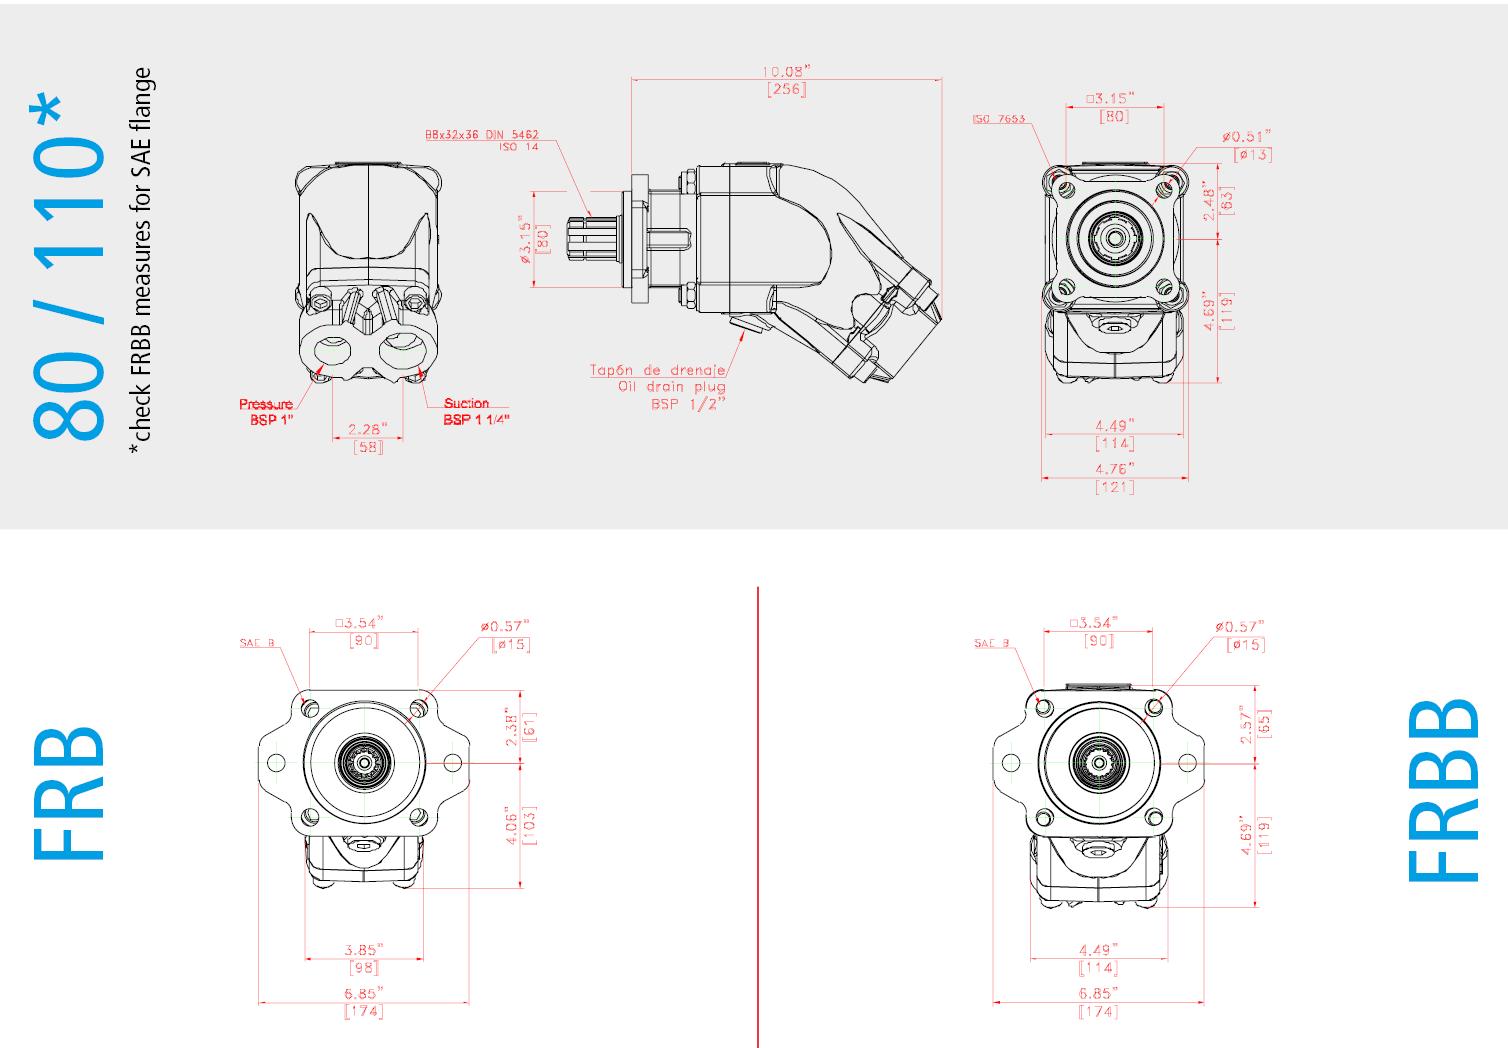 FR Bent-Axis Piston Pump instructions - Bezares SA